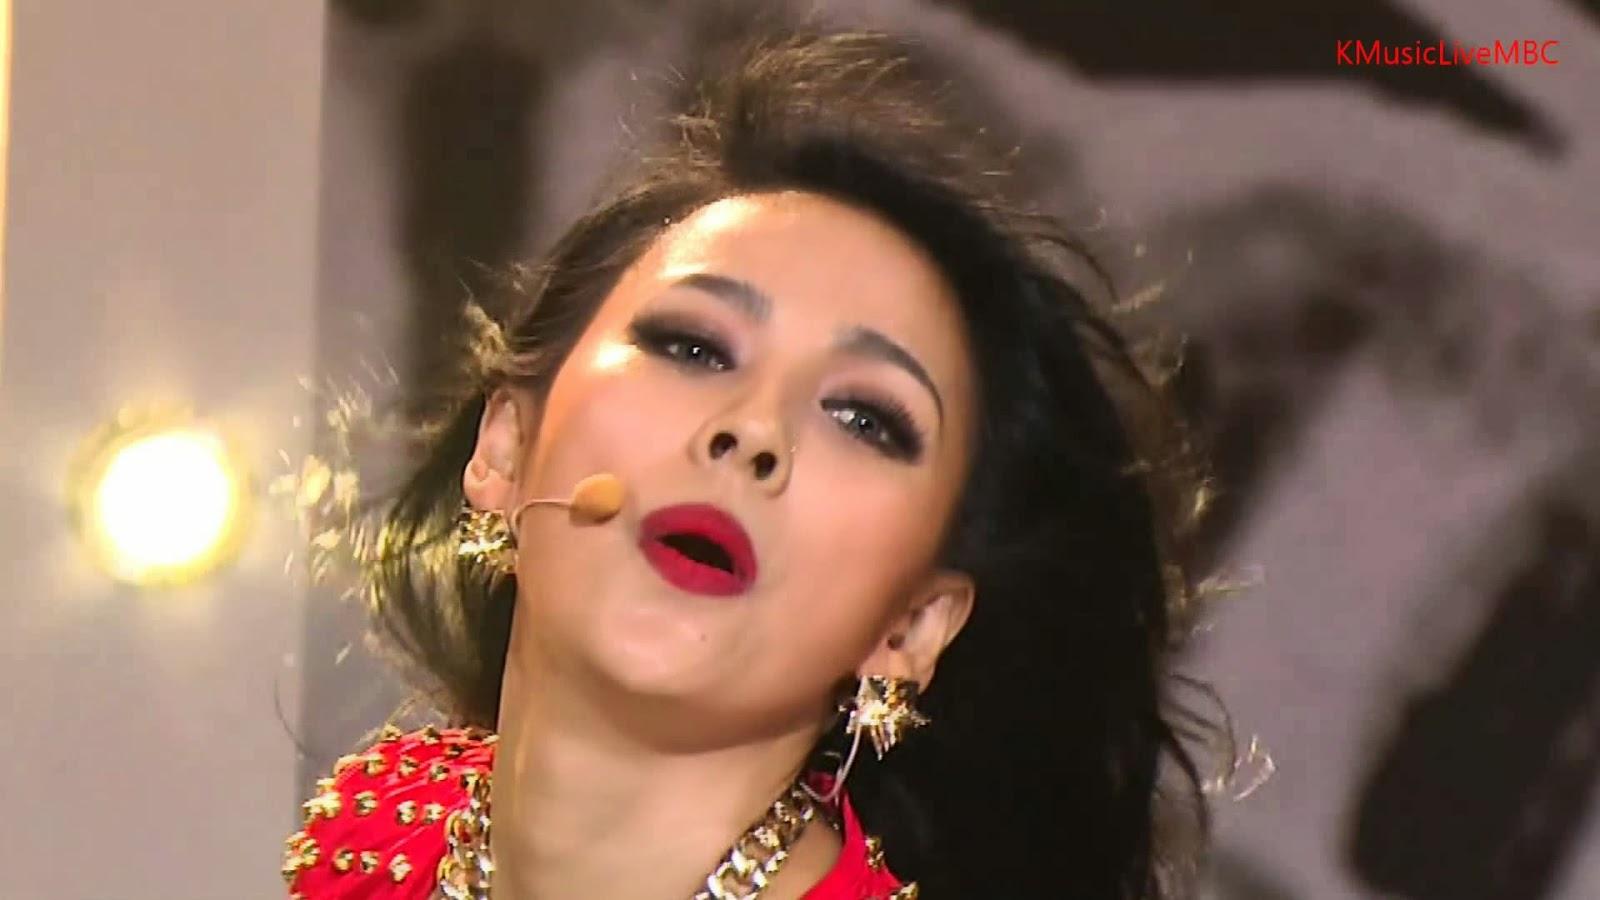 Lee Hyori Bad Girl live performanceLee Hyori 2013 Tattoo